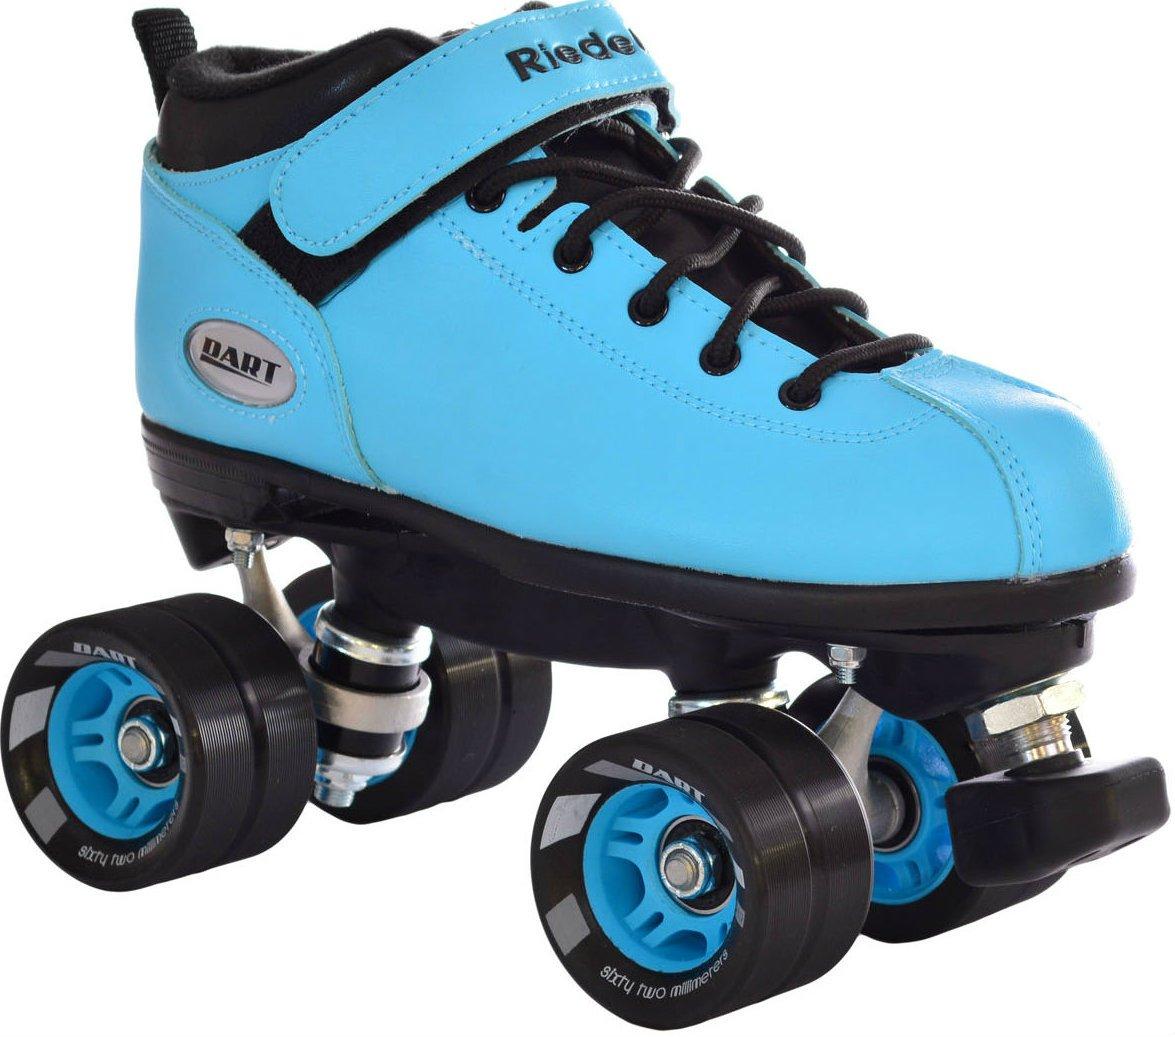 Zebra roller skates - Amazon Com Riedell Dart Ice Blue Quad Roller Derby Speed Skates Sports Outdoors